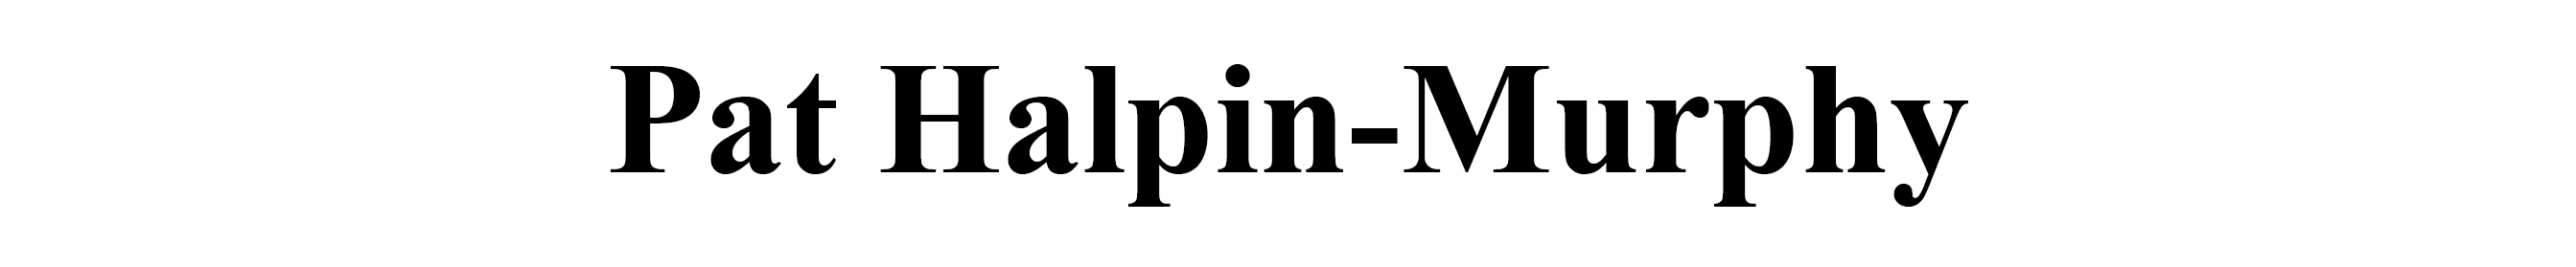 Pat Halpin-Murphy